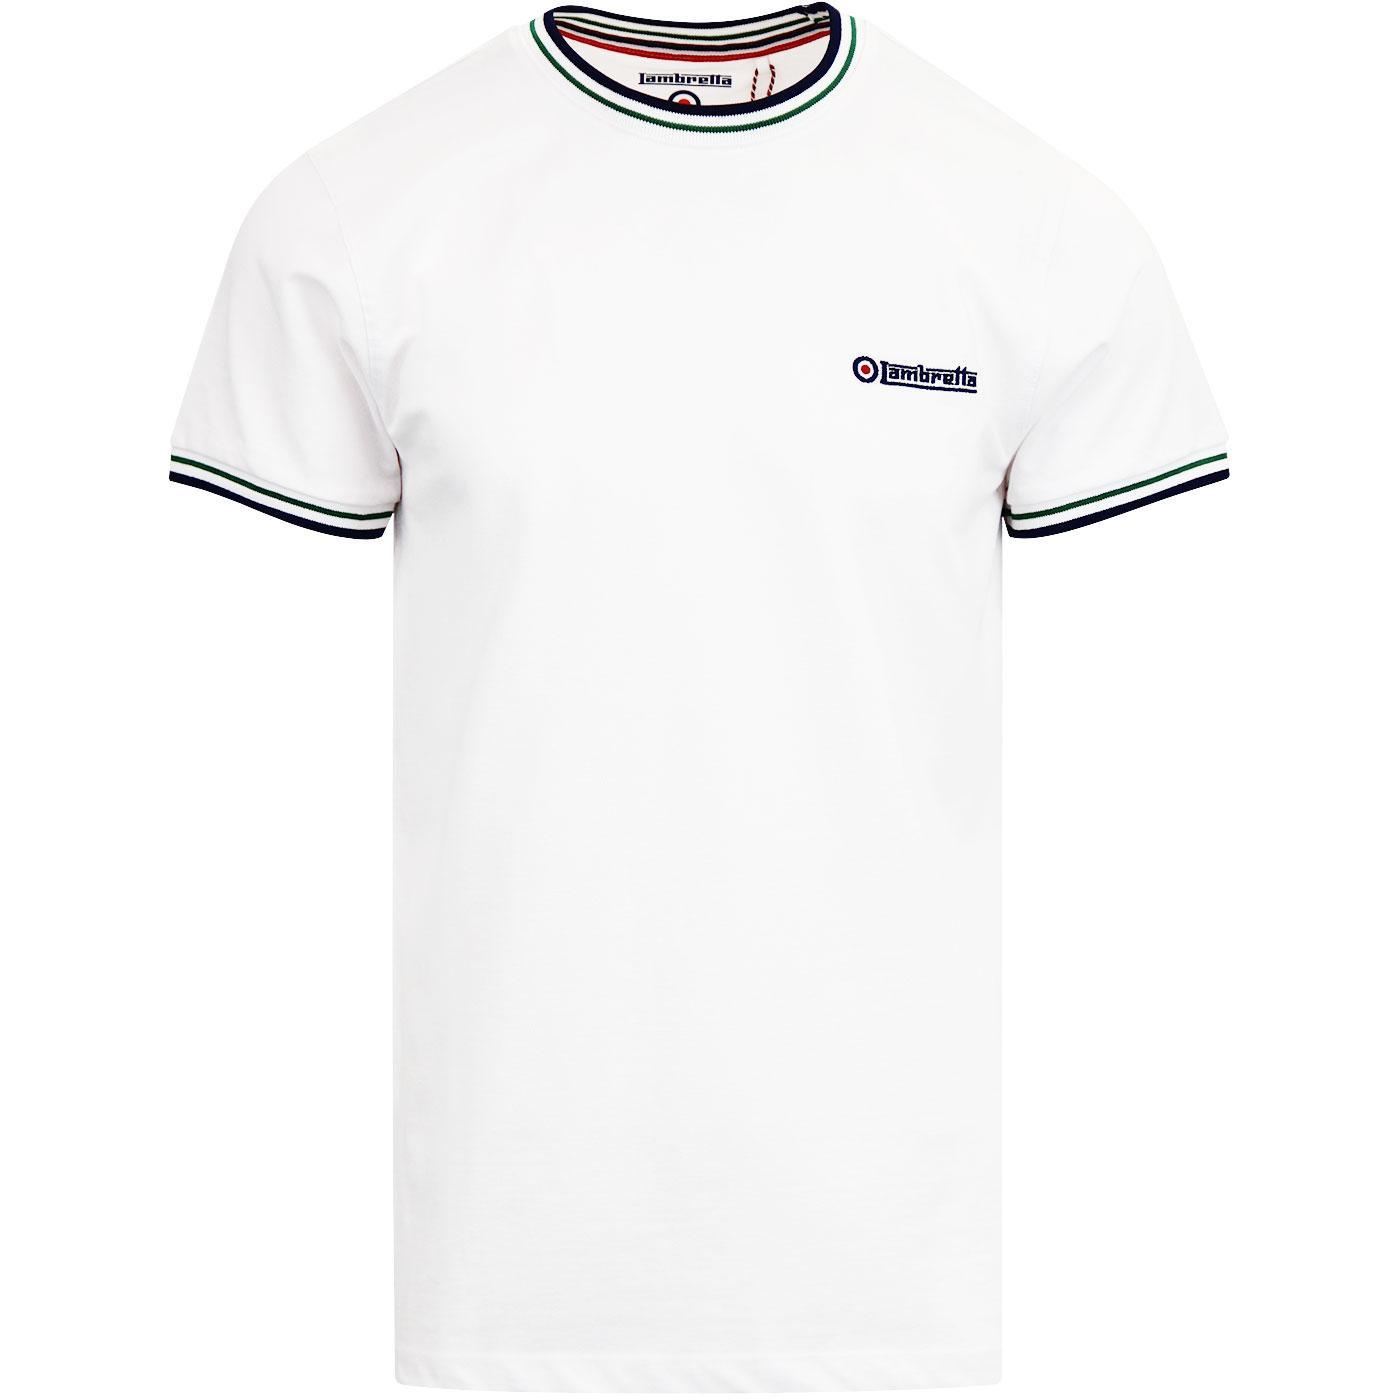 LAMBRETTA Men's Retro Tipped Pique T-shirt WHITE